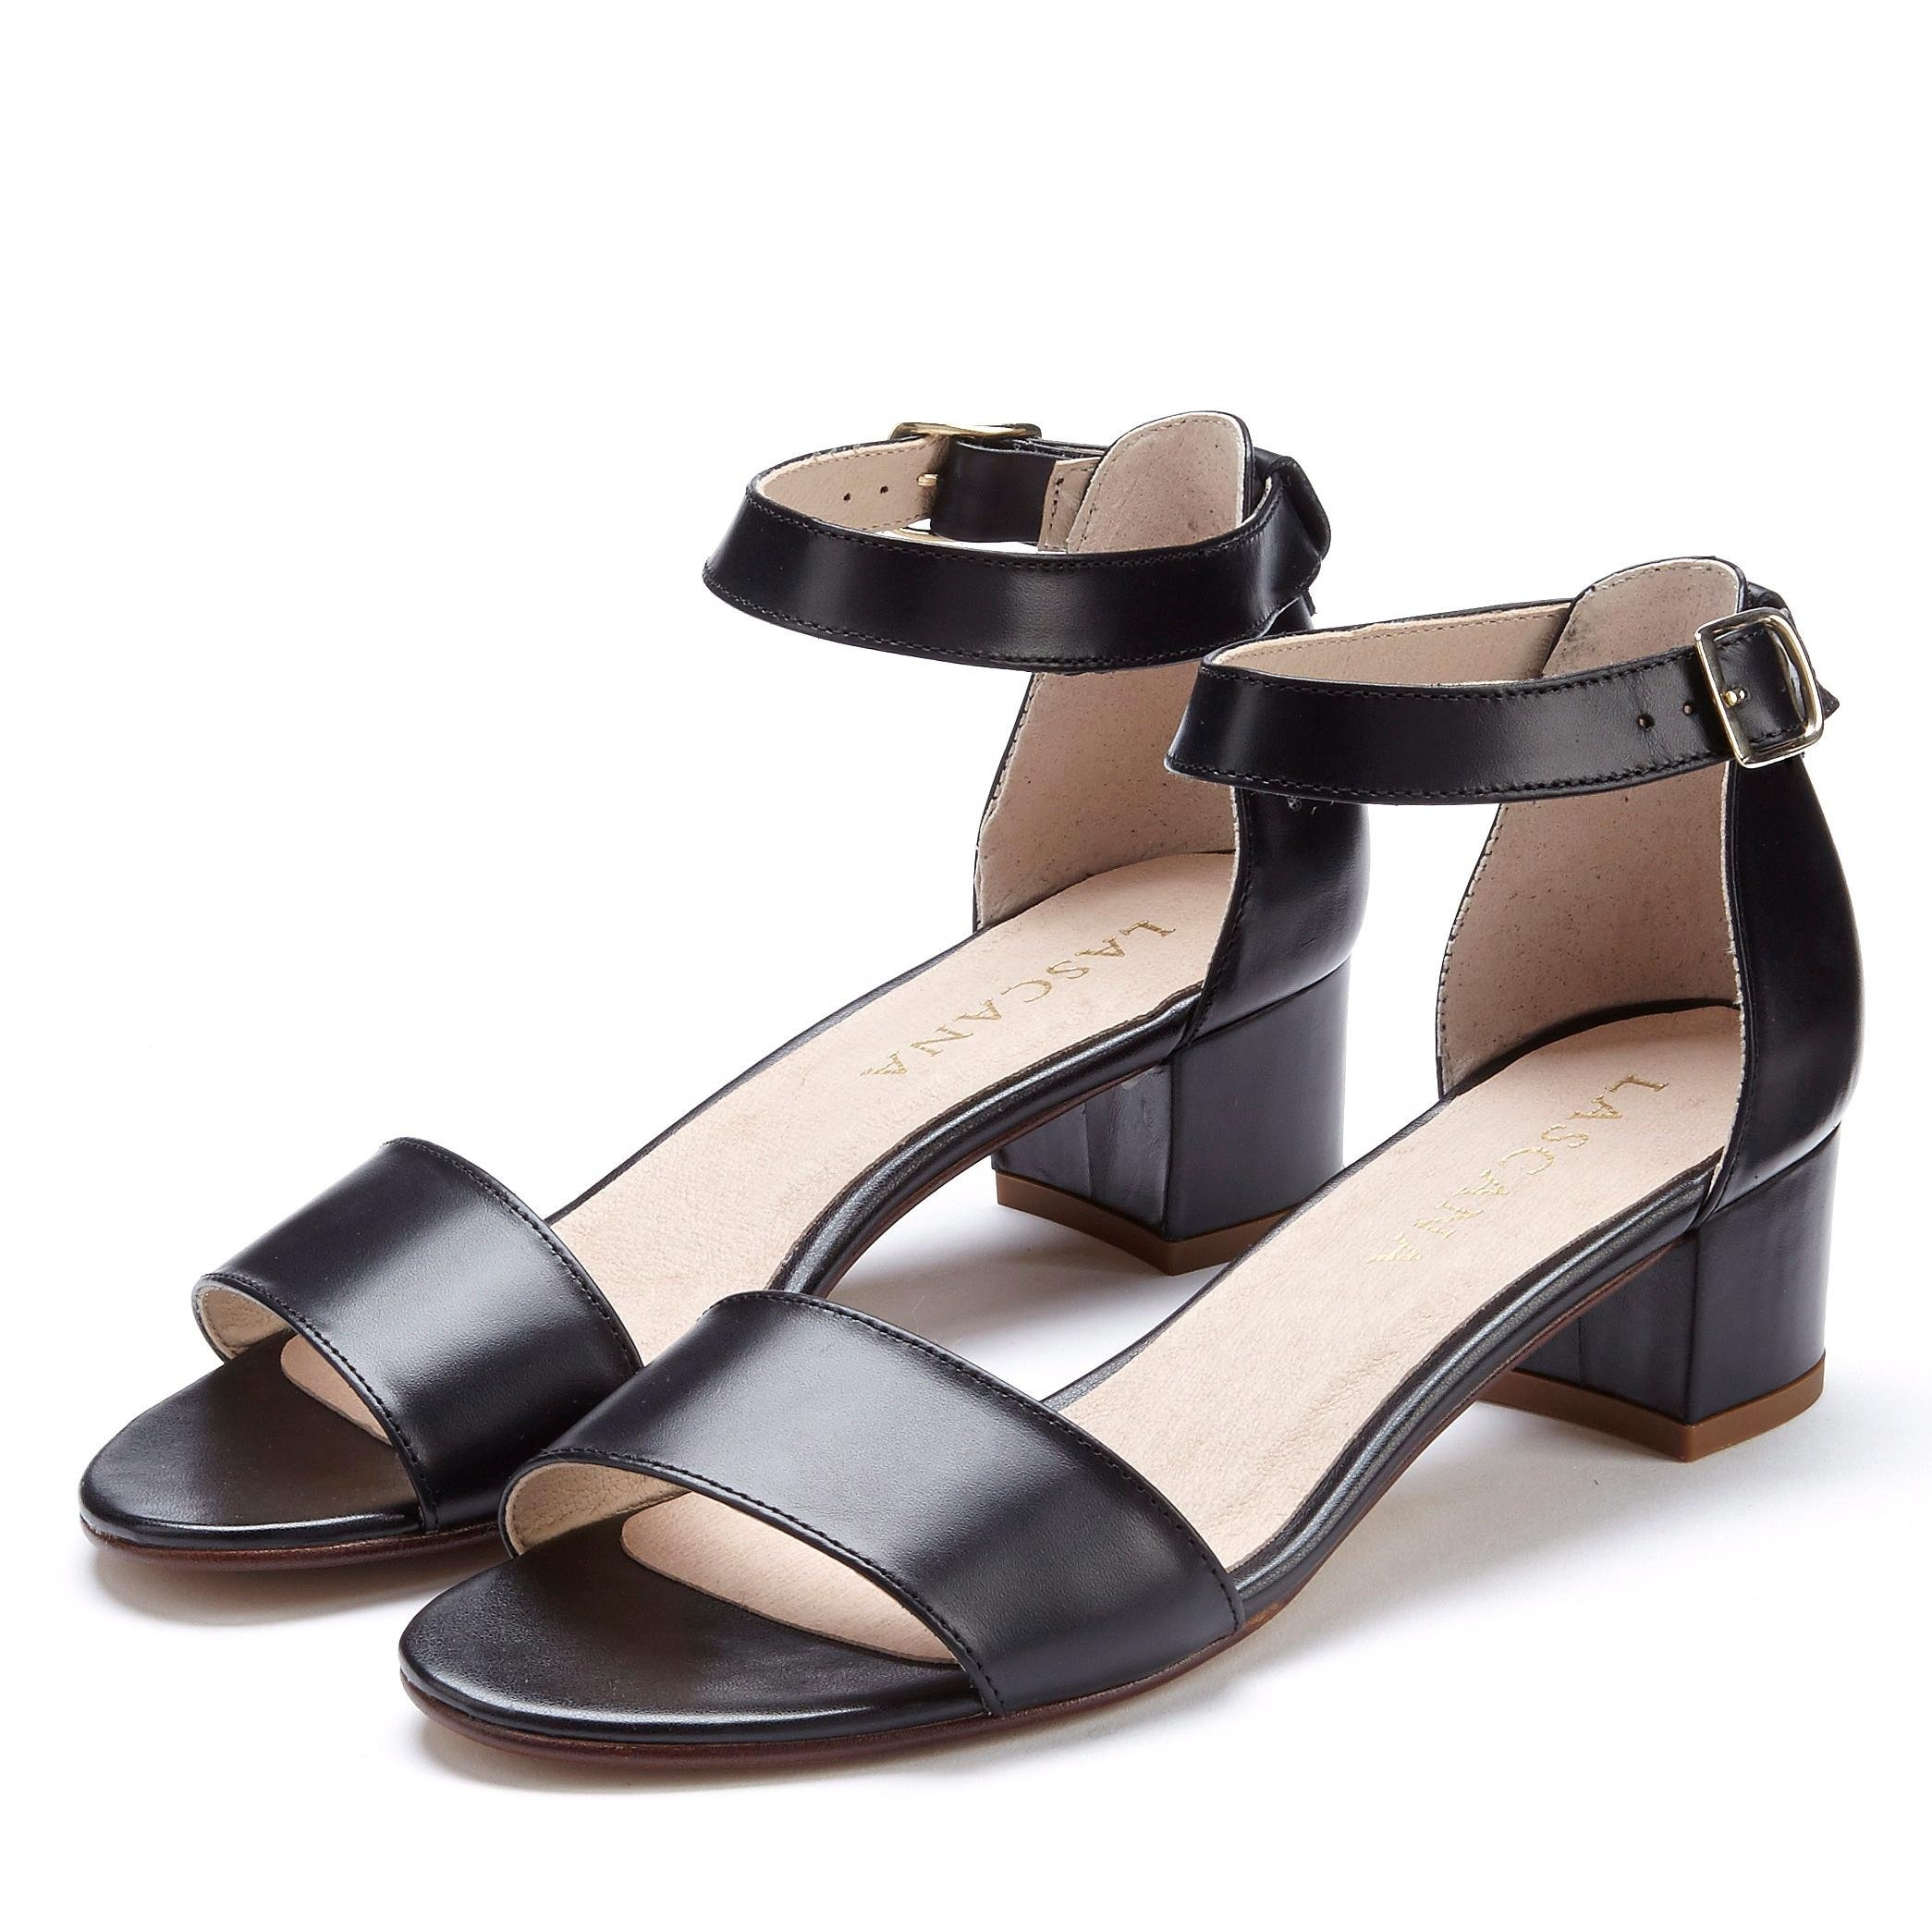 LASCANA sandaaltjes - gratis ruilen op otto.nl